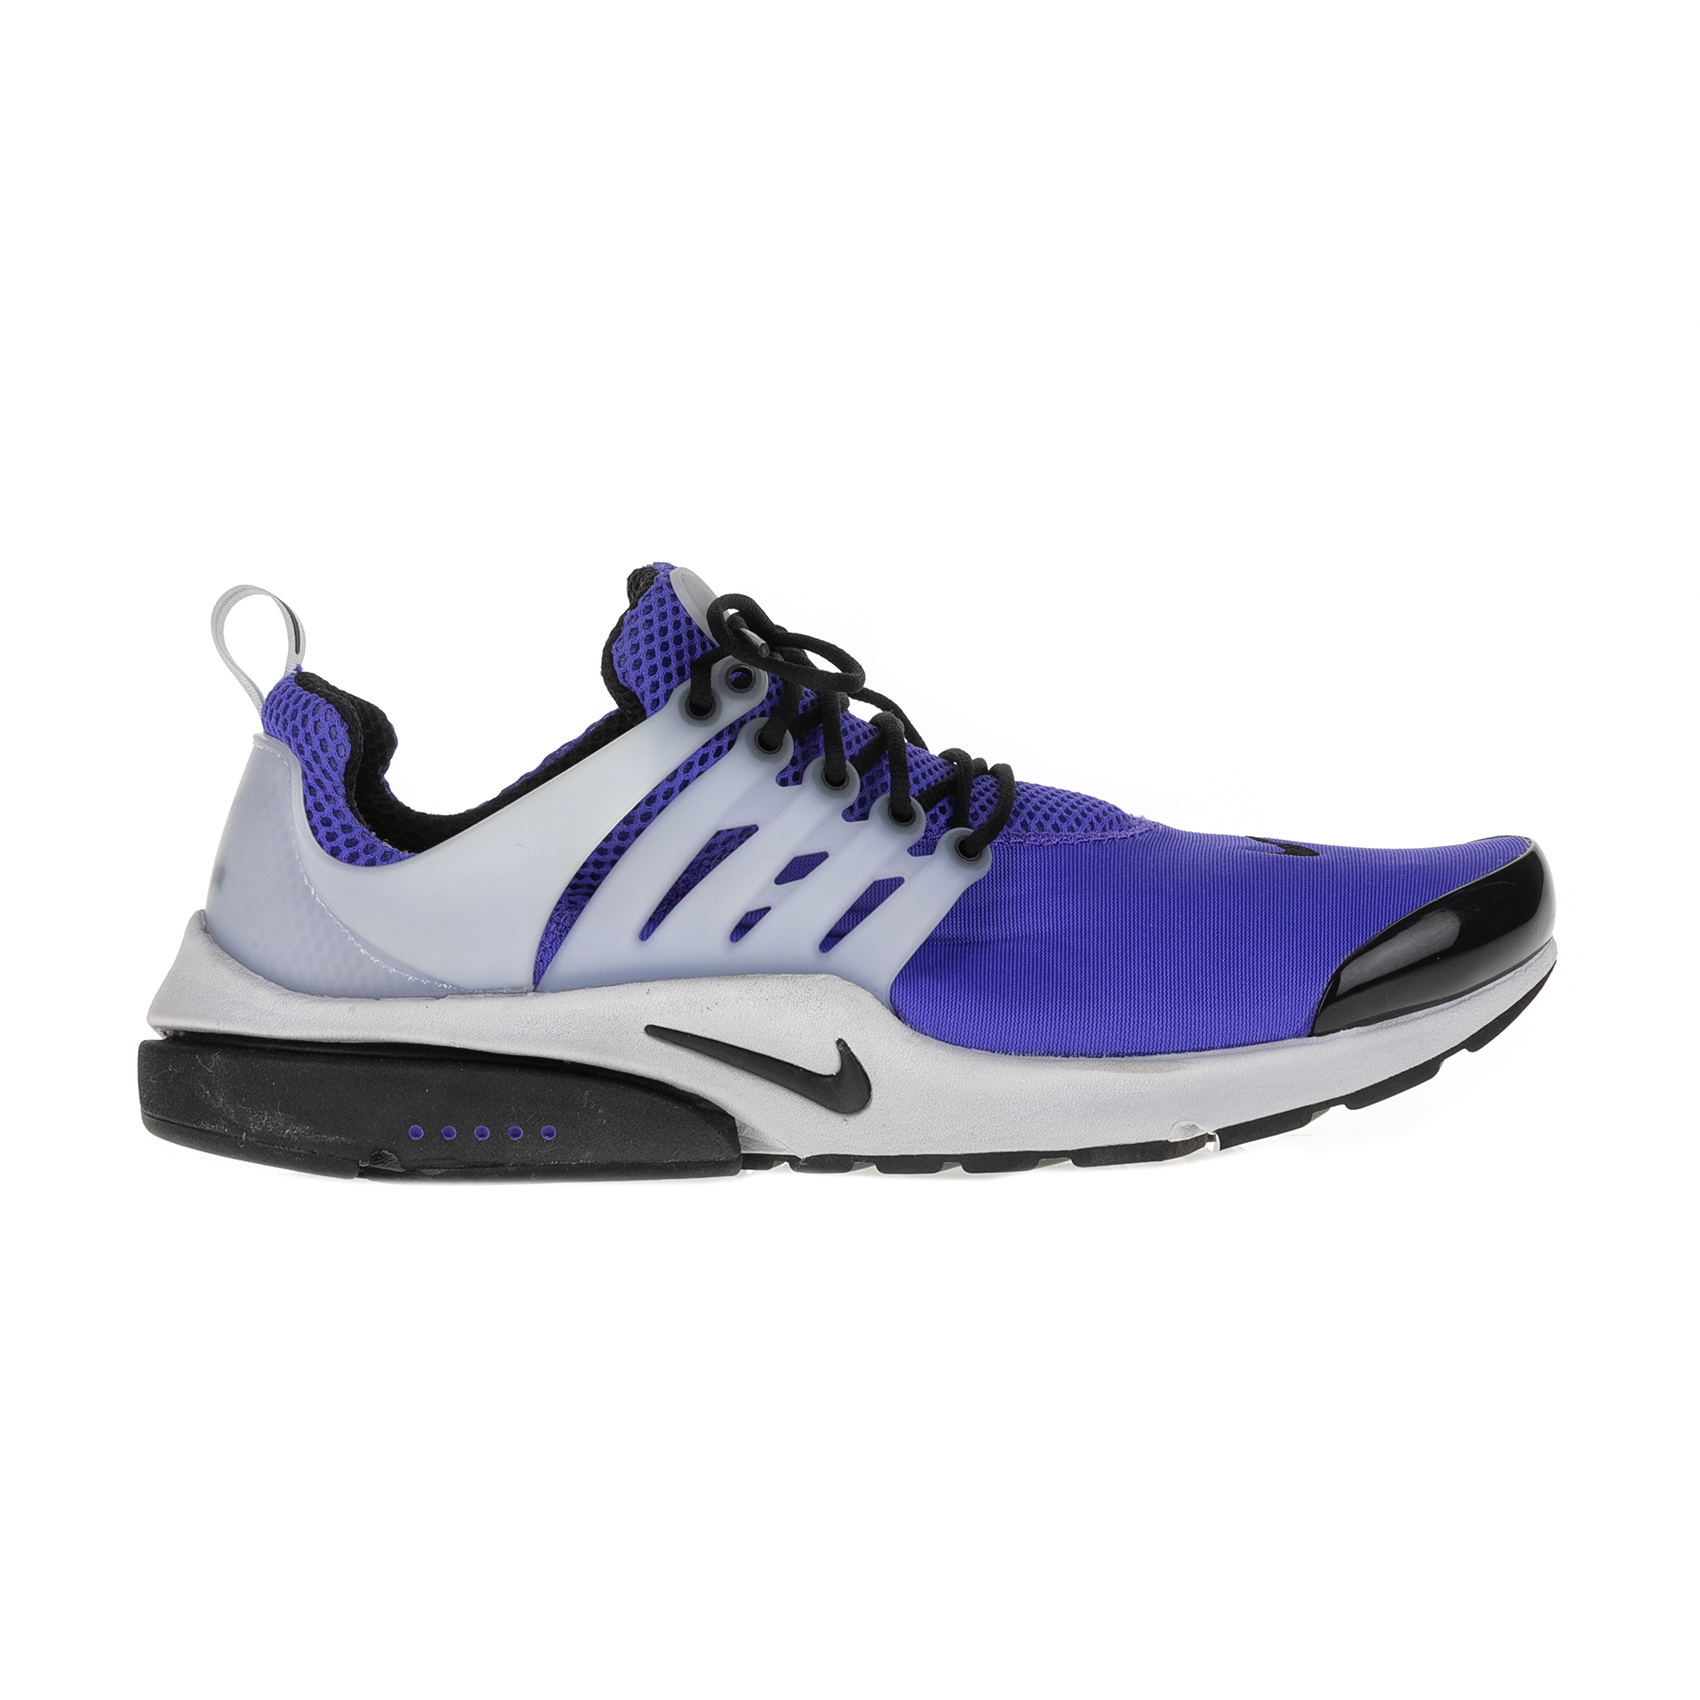 NIKE – Ανδρικά αθλητικά παπούτσια Nike AIR PRESTO μπλε – λευκά